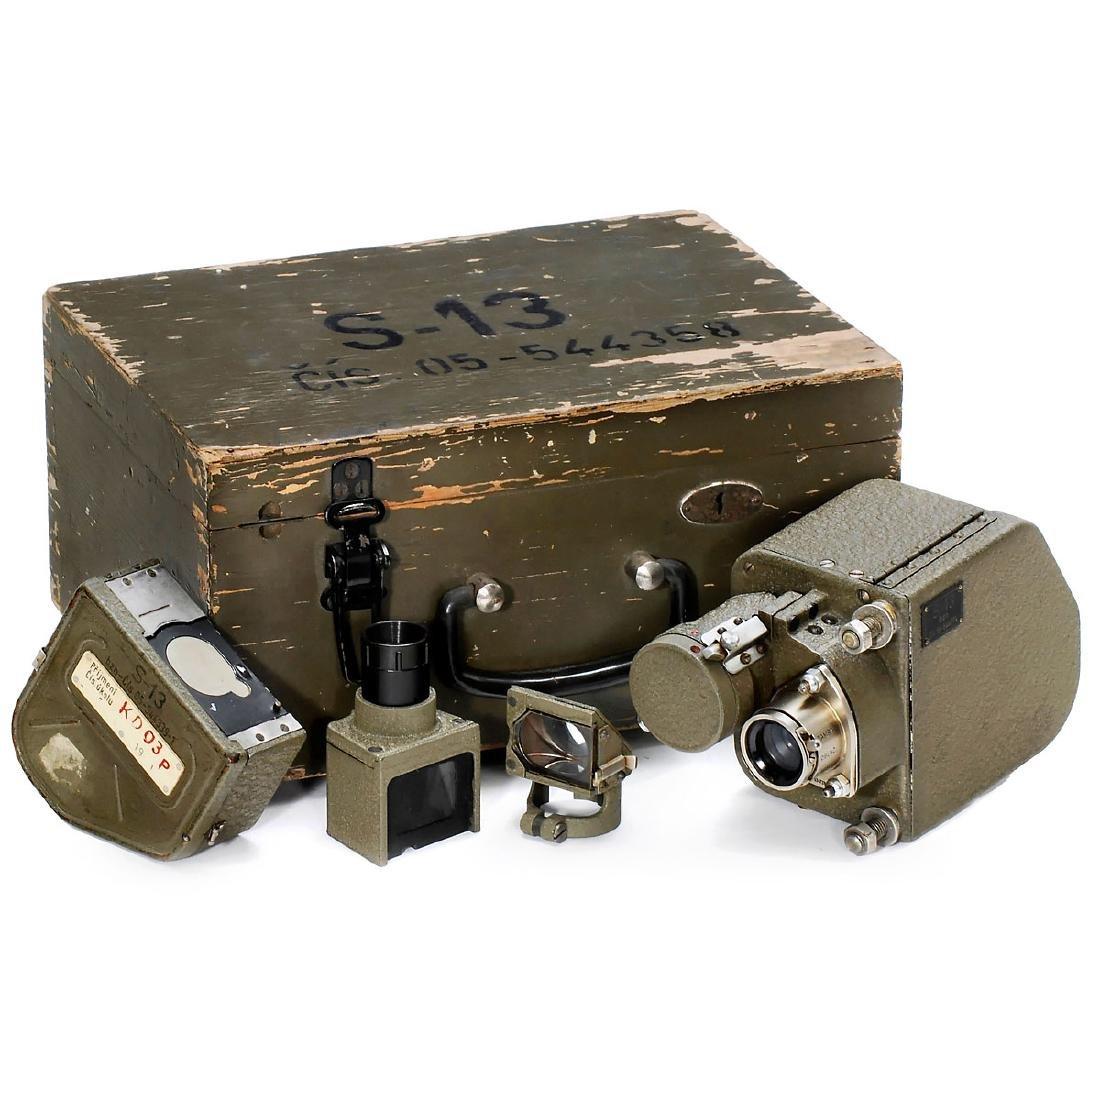 "Czechoslovakian ""S-13"" Aerial Camera, 1950/60s"